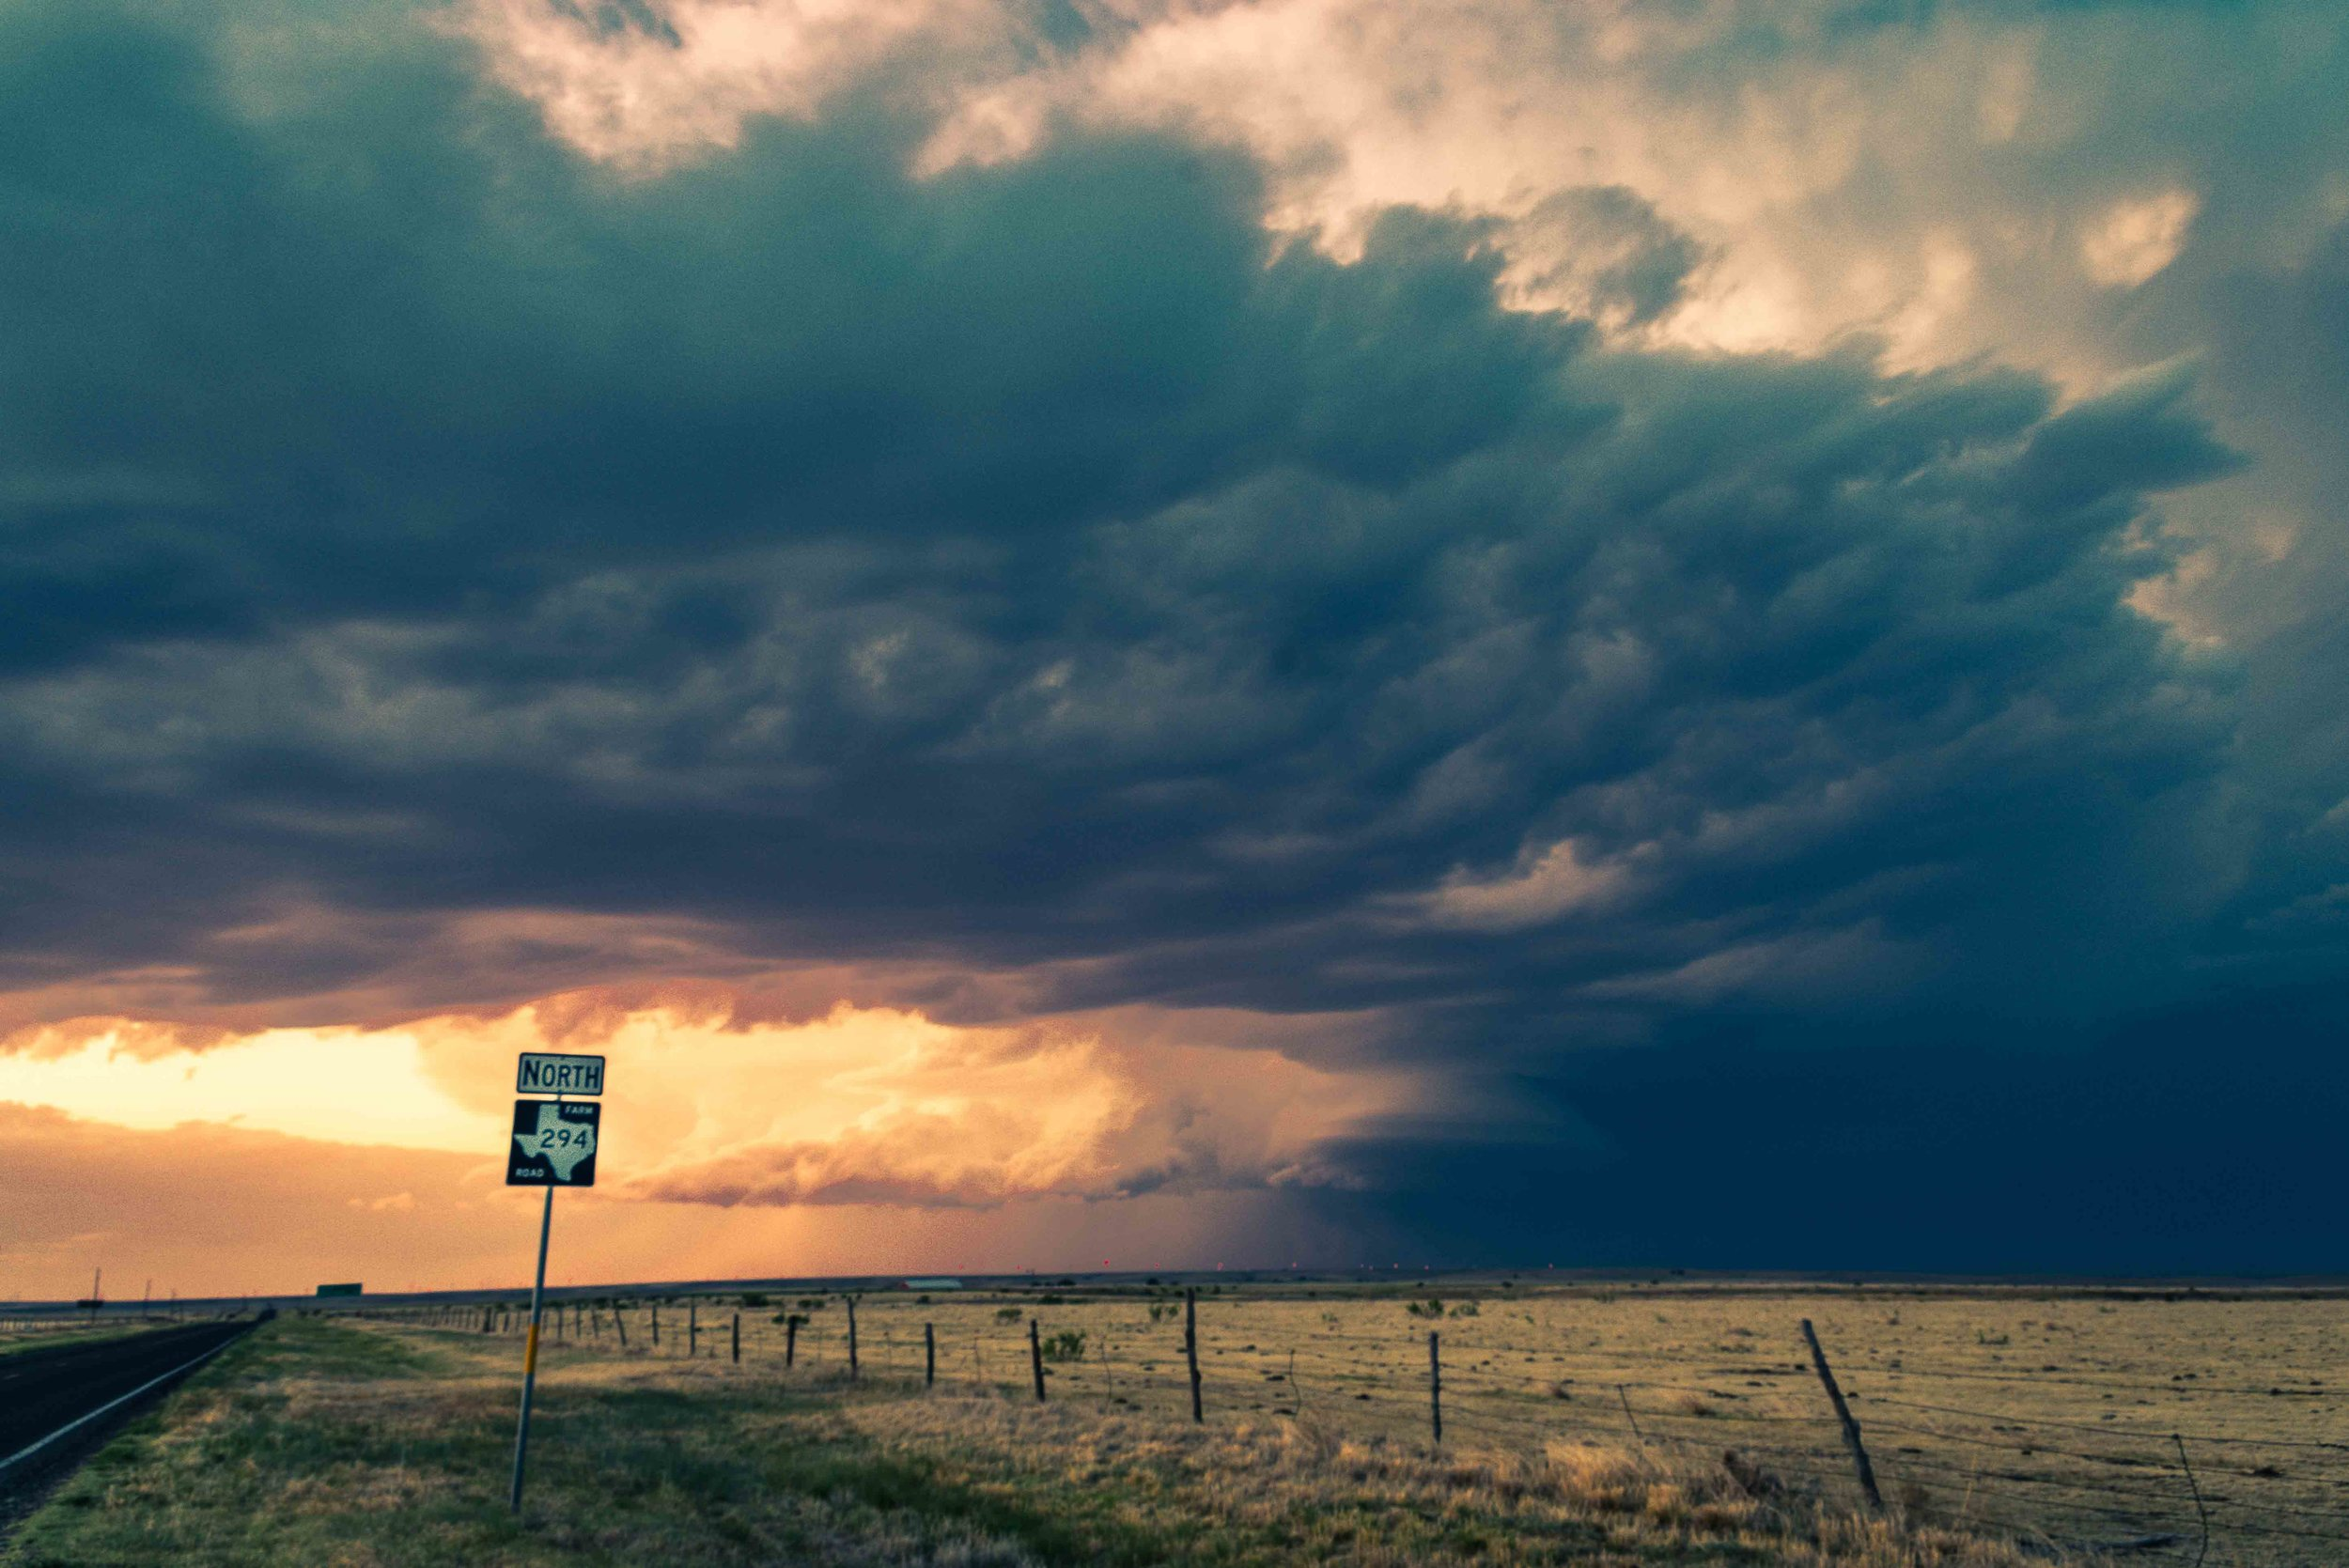 Llano Estacado - Claude, Texas